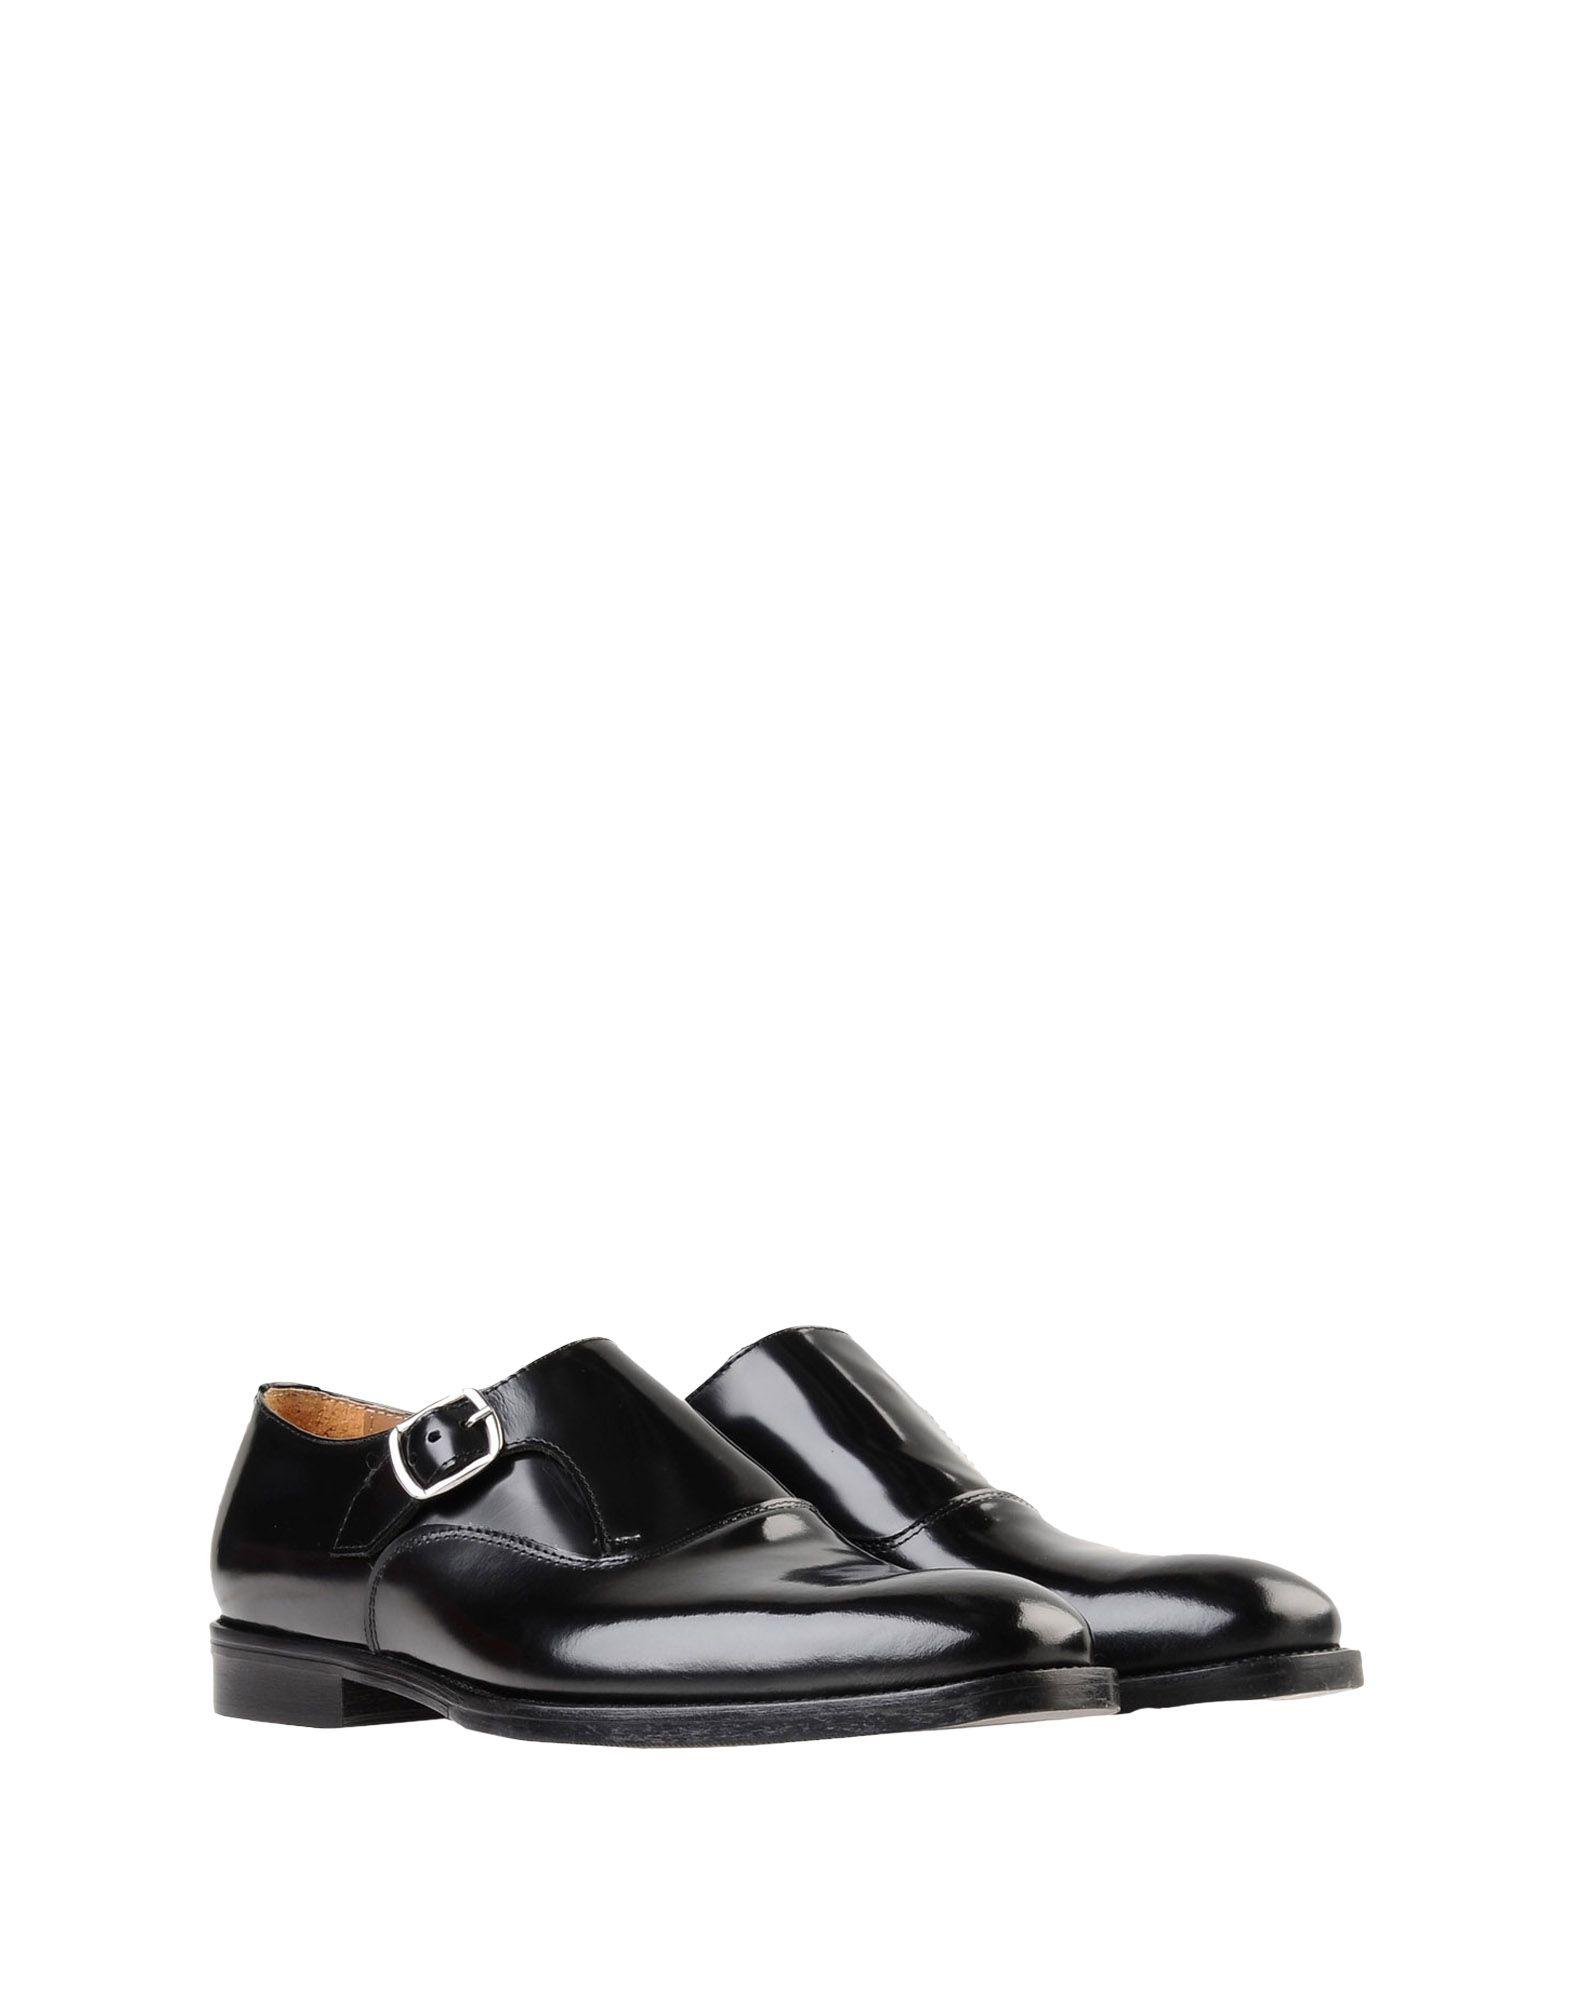 Leonardo Principi Mokassins Qualität Herren  11541813PA Gute Qualität Mokassins beliebte Schuhe 91fe0f